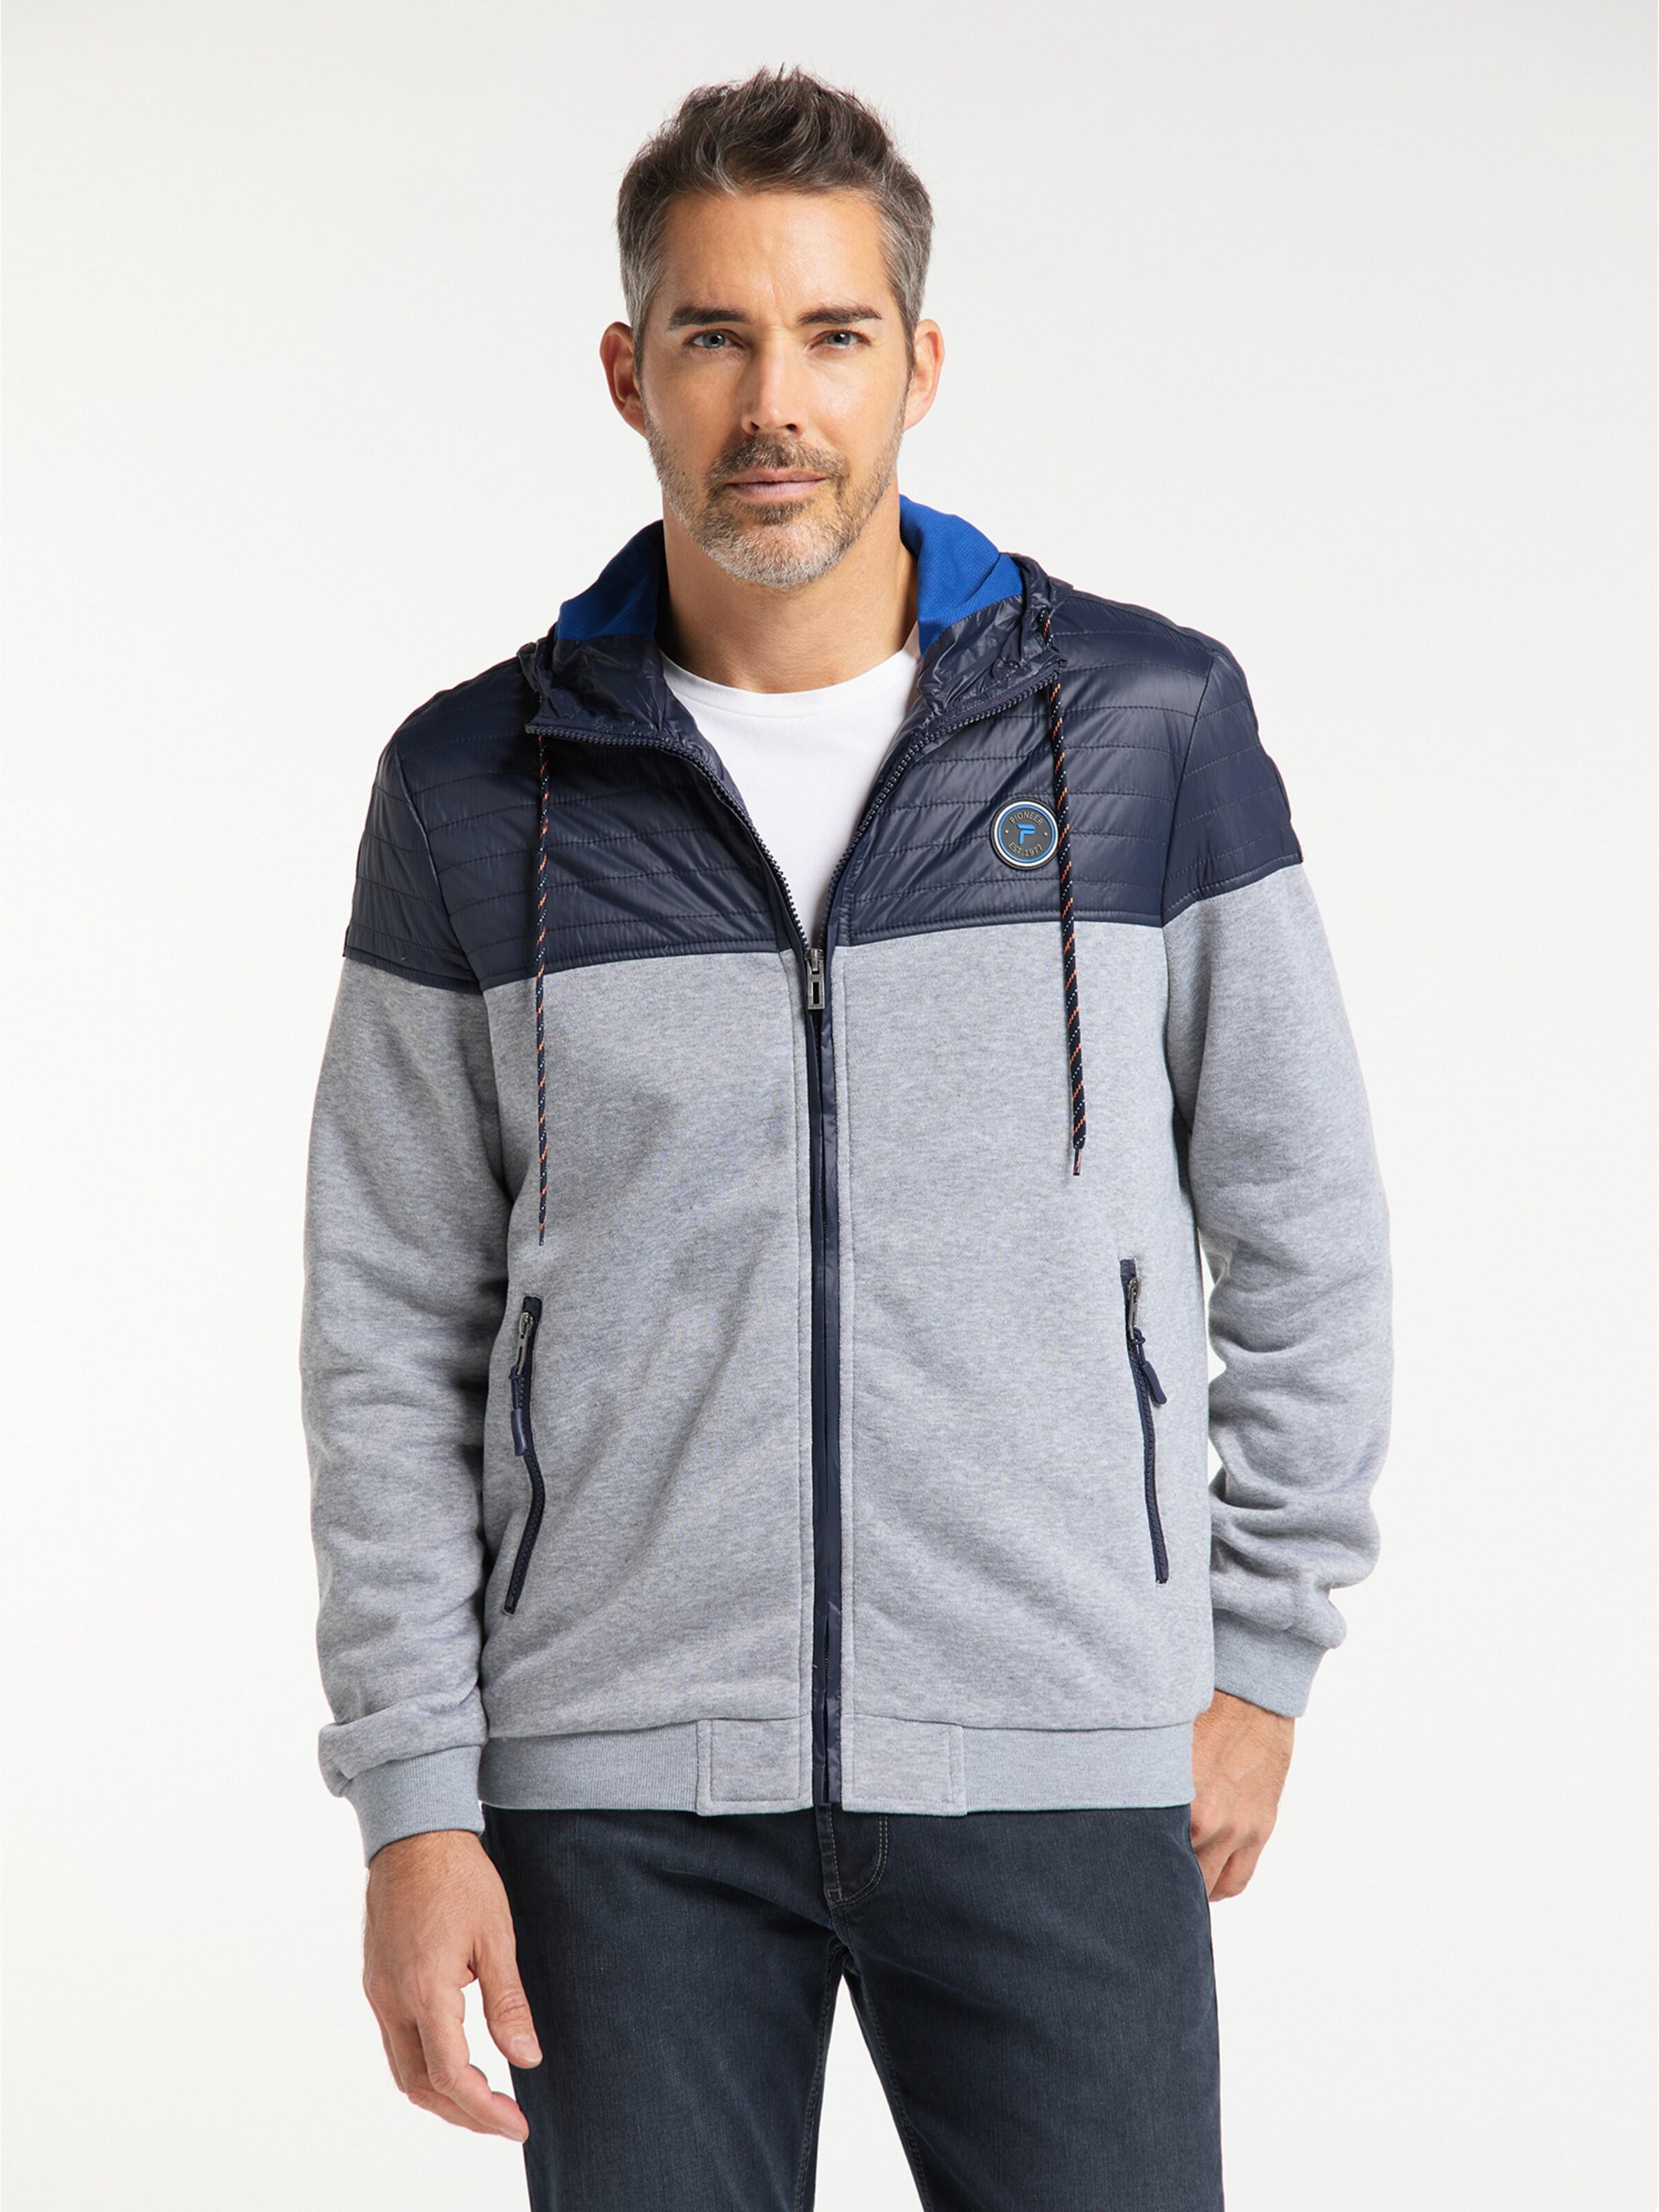 PIONEER Jacke in blau / graumeliert Mit Kapuze 04056/000/02493-587-3XL